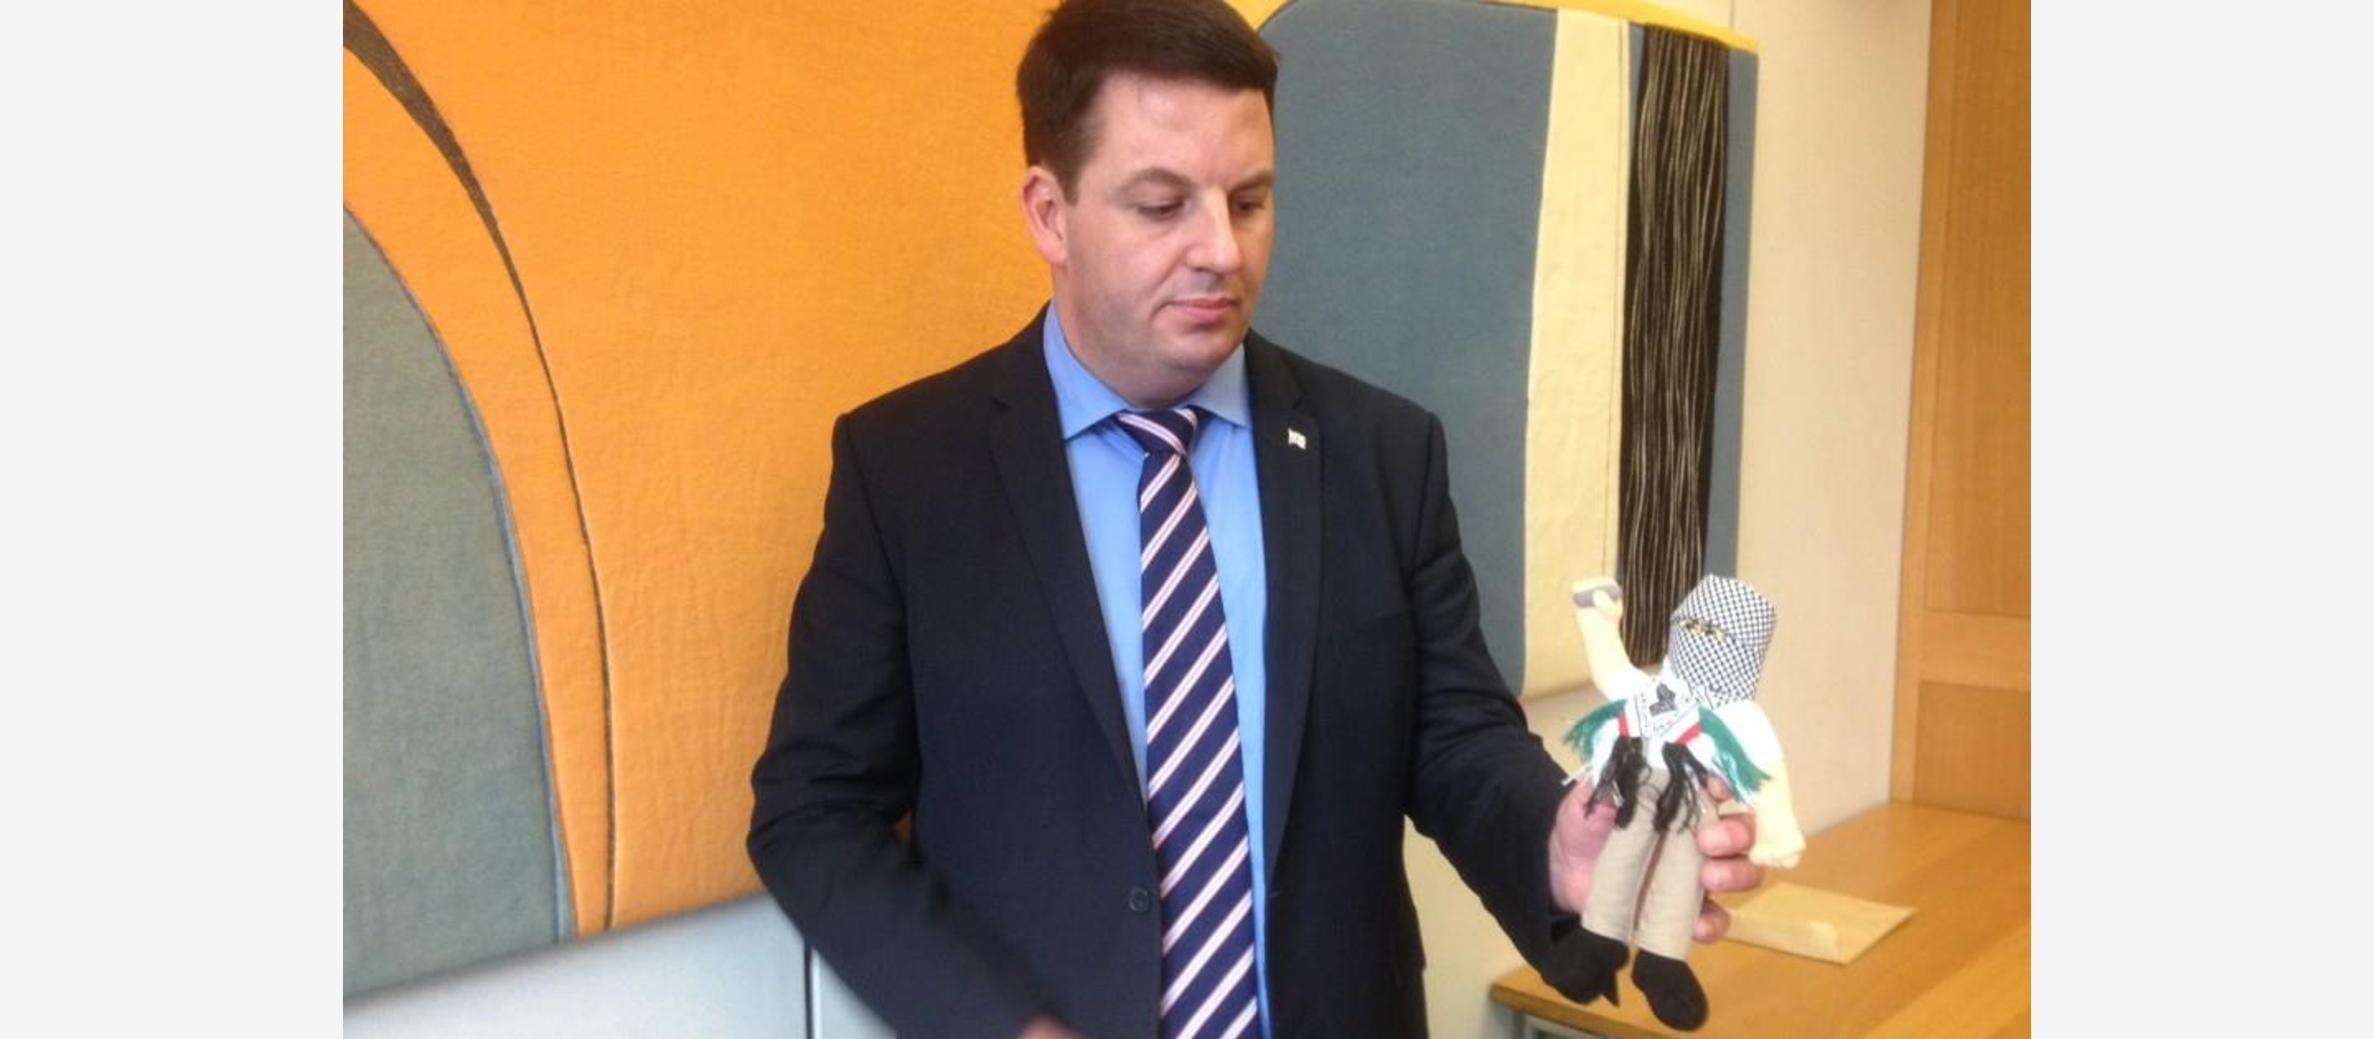 MP brandishes Palestinian 'terror doll' in UK Parliament debate